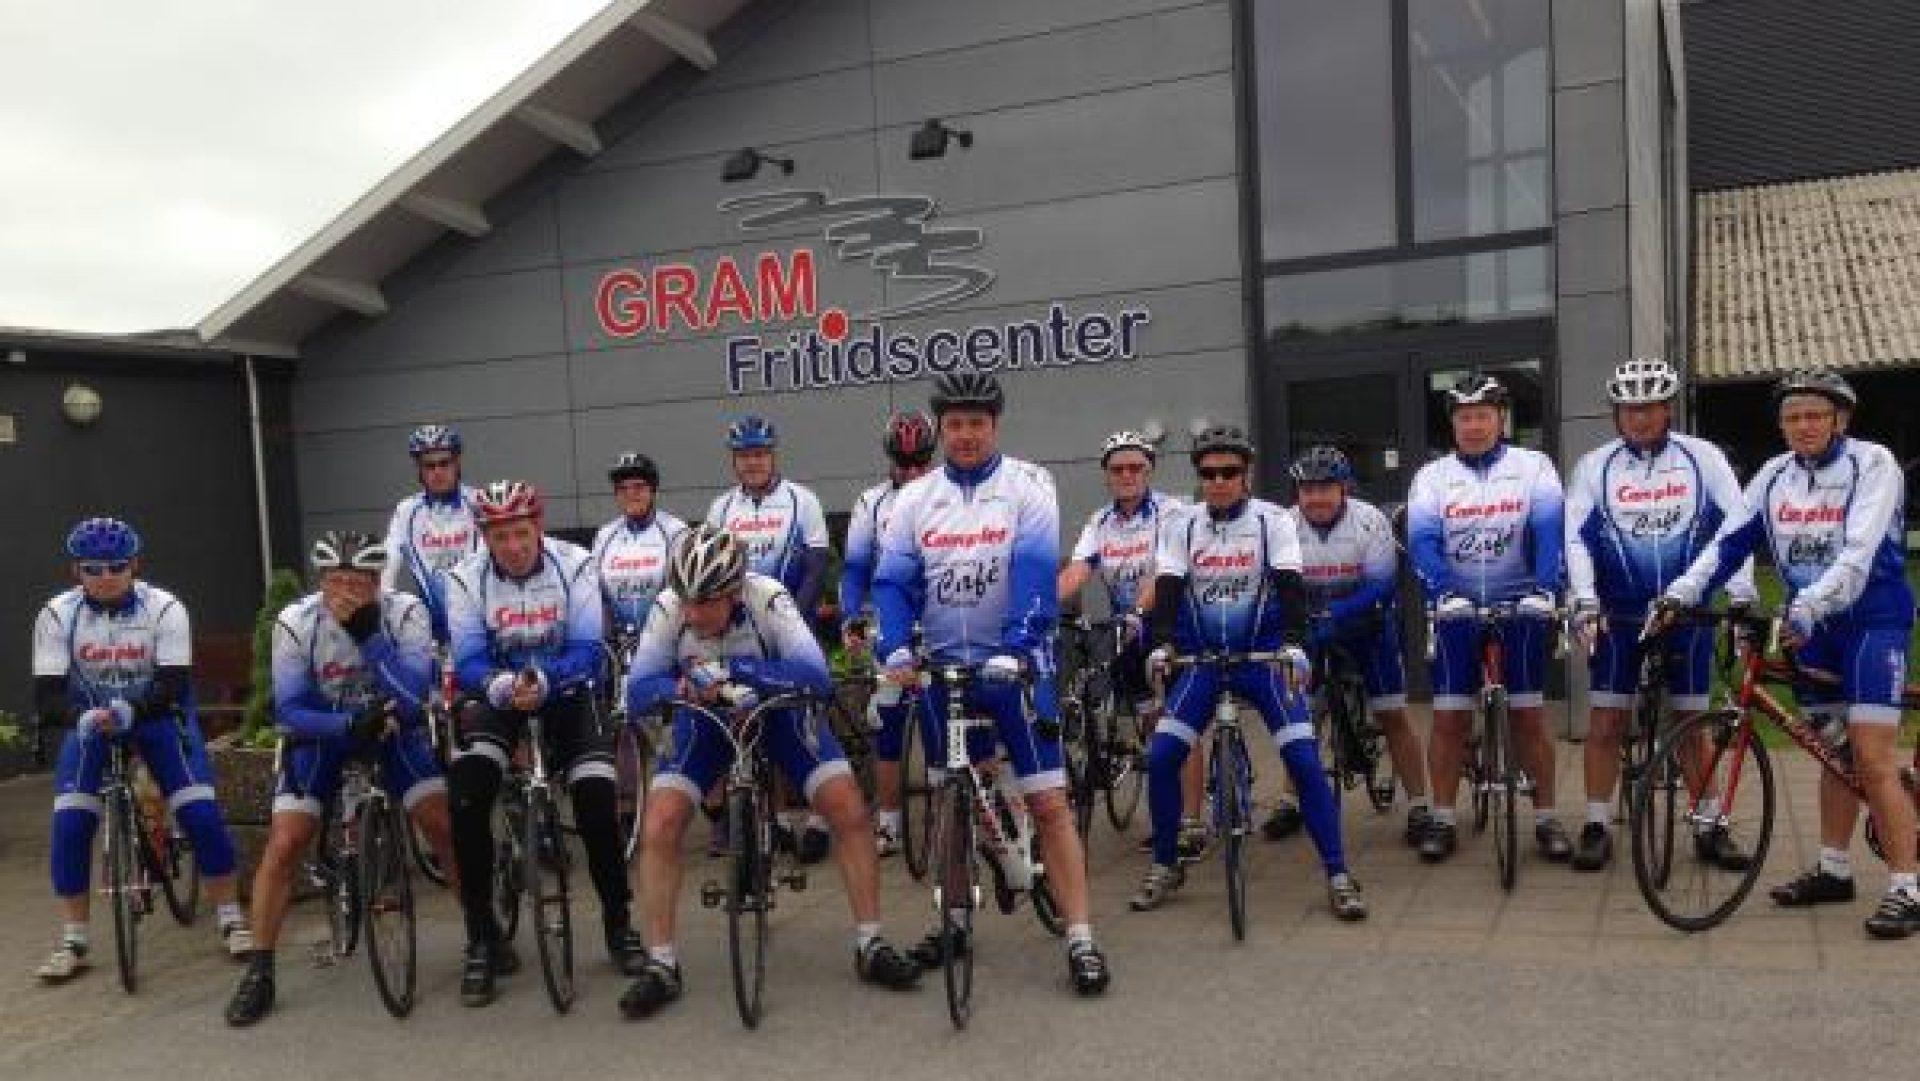 Gram Cykelklub